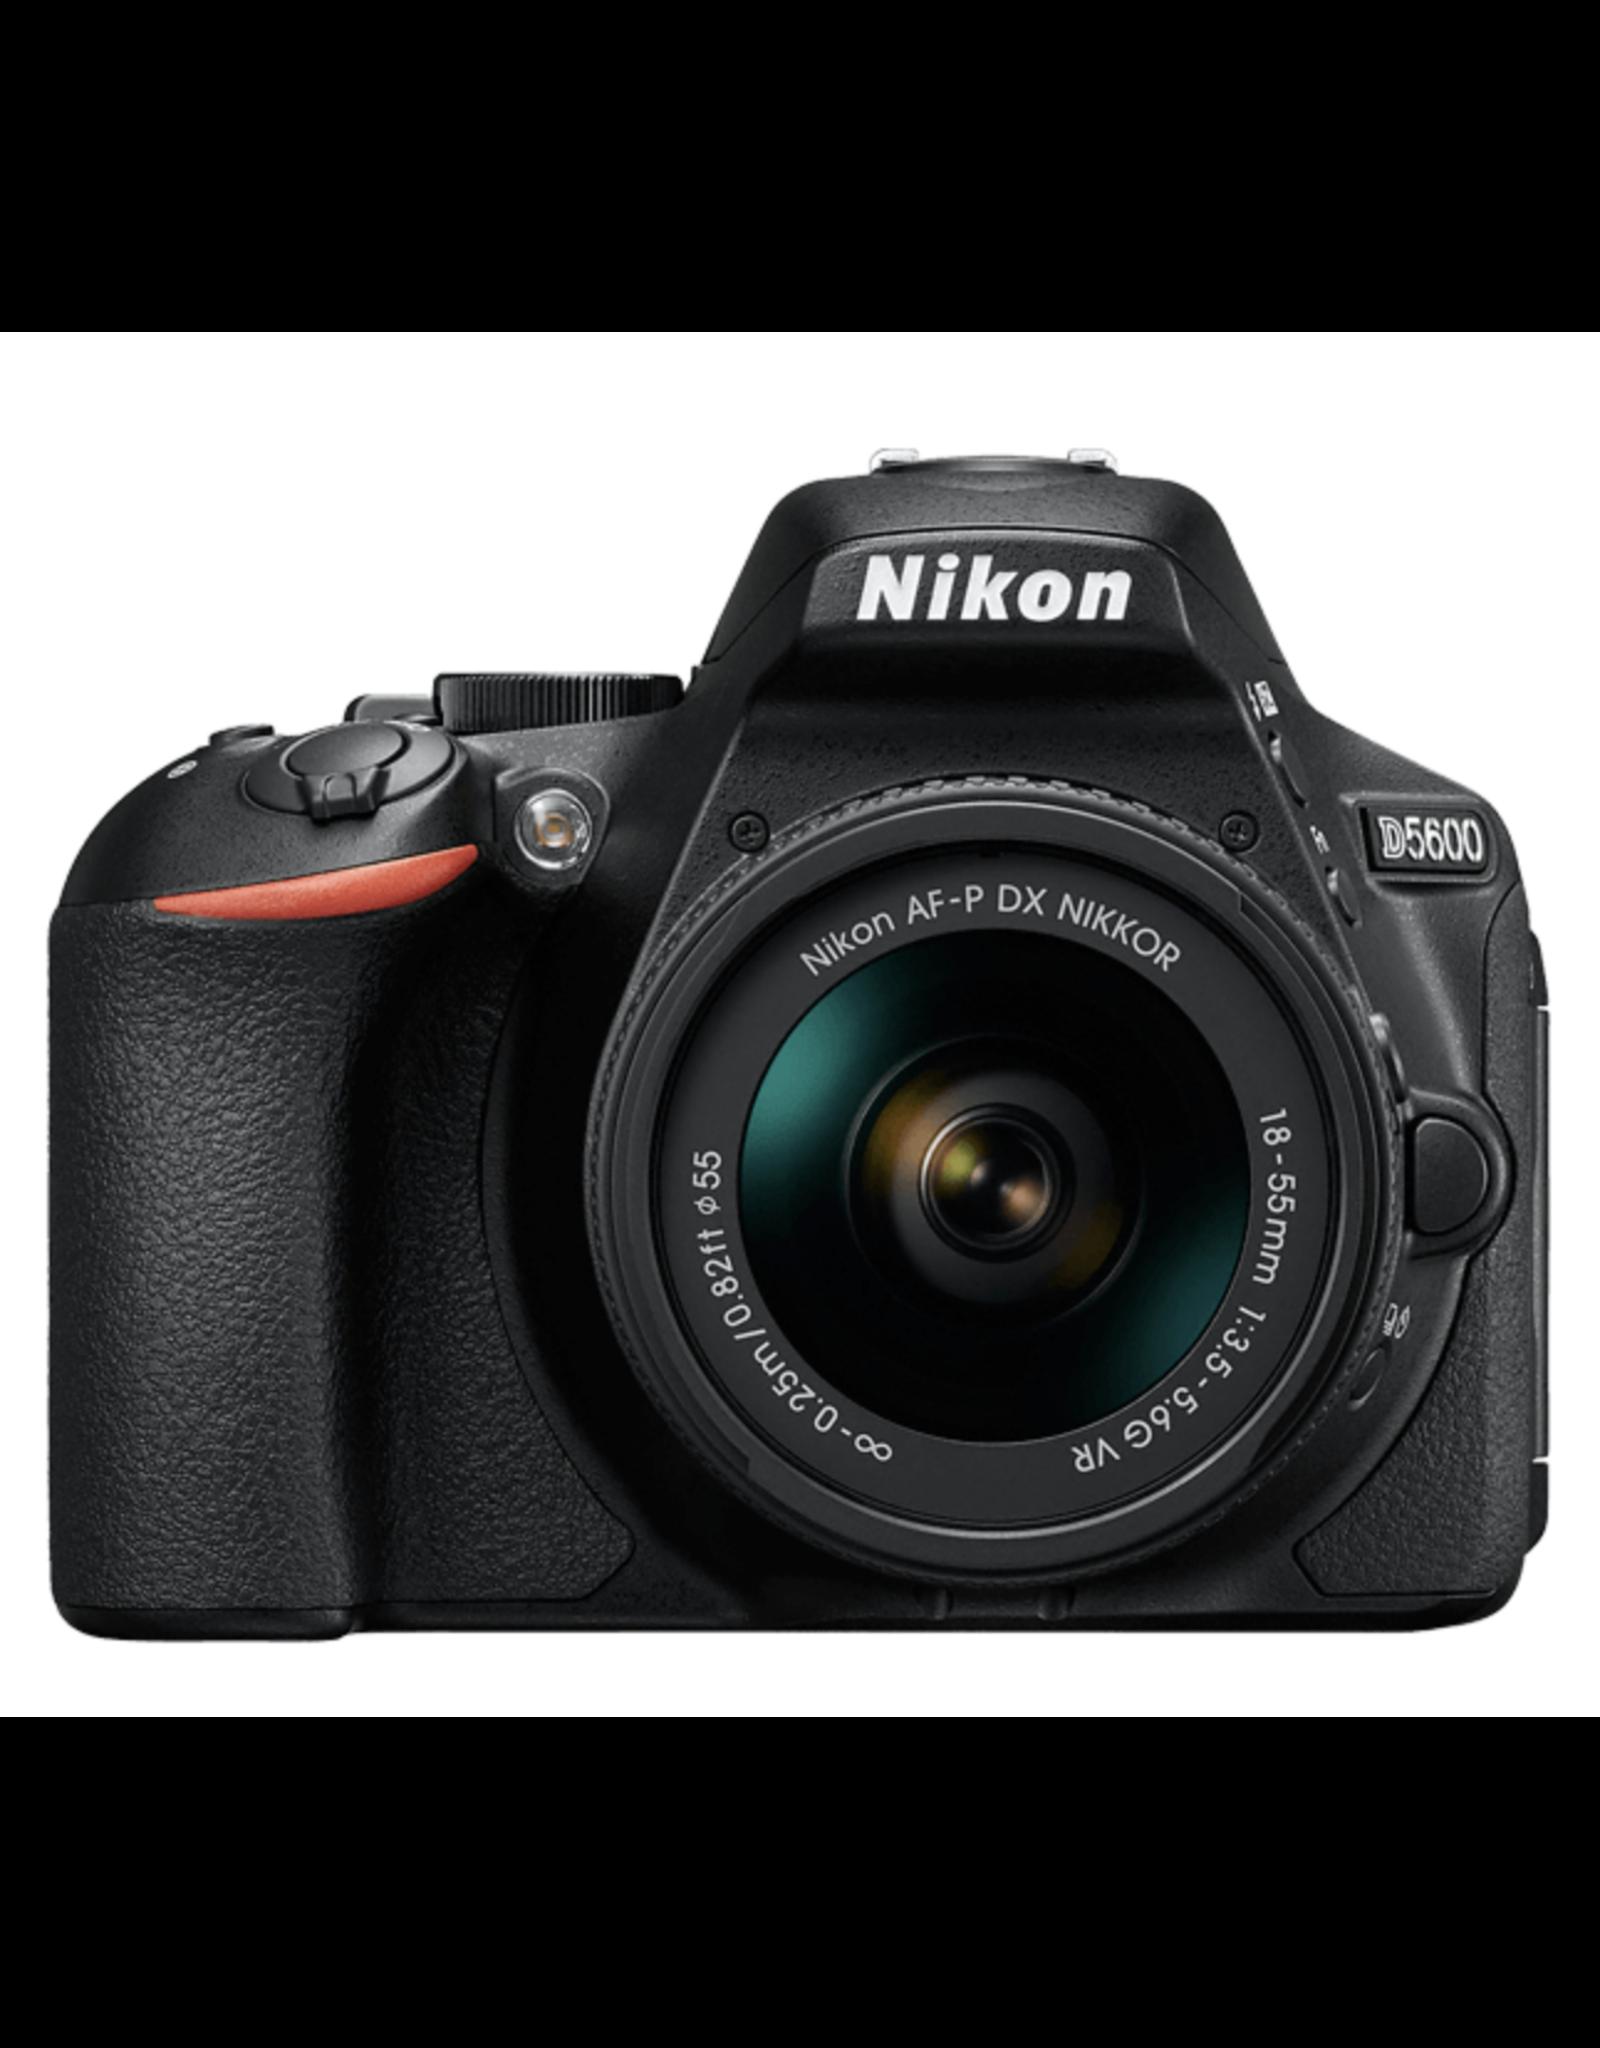 Nikon Nikon D5600 DSLR Camera with 18-55mm Lens